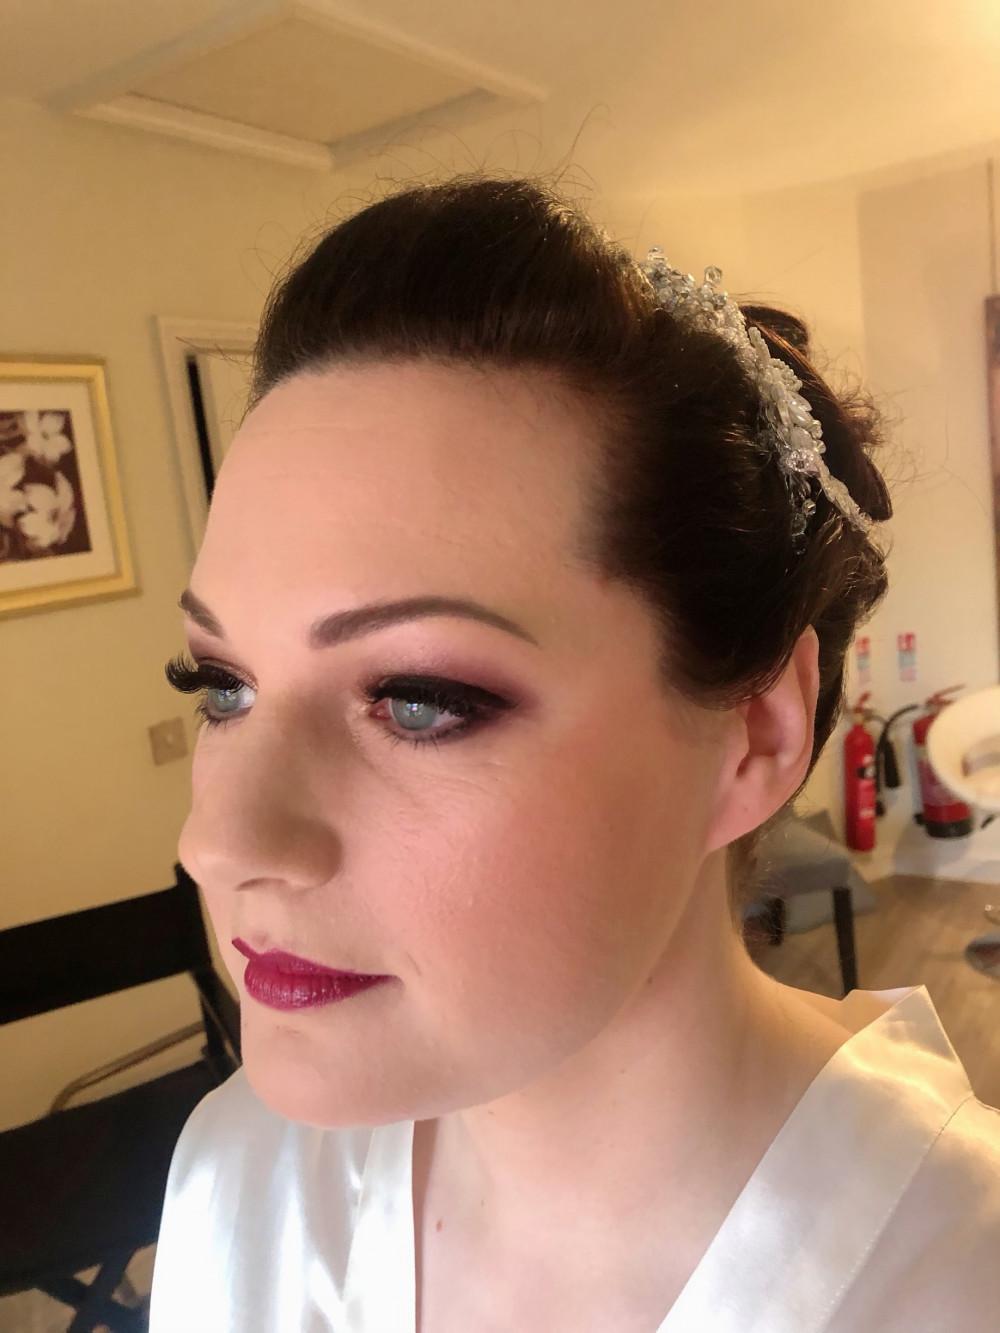 Bridal hair & makeup at Manor by the lake. - Make Me Bridal Artist: Rebecca Haines Makeup and Hair. Photography by: me. #weddinghairandmakeup #weddingmakeup #weddingmakeupartist #weddinghairstylist #manorbythelake #cheltenhamwedding